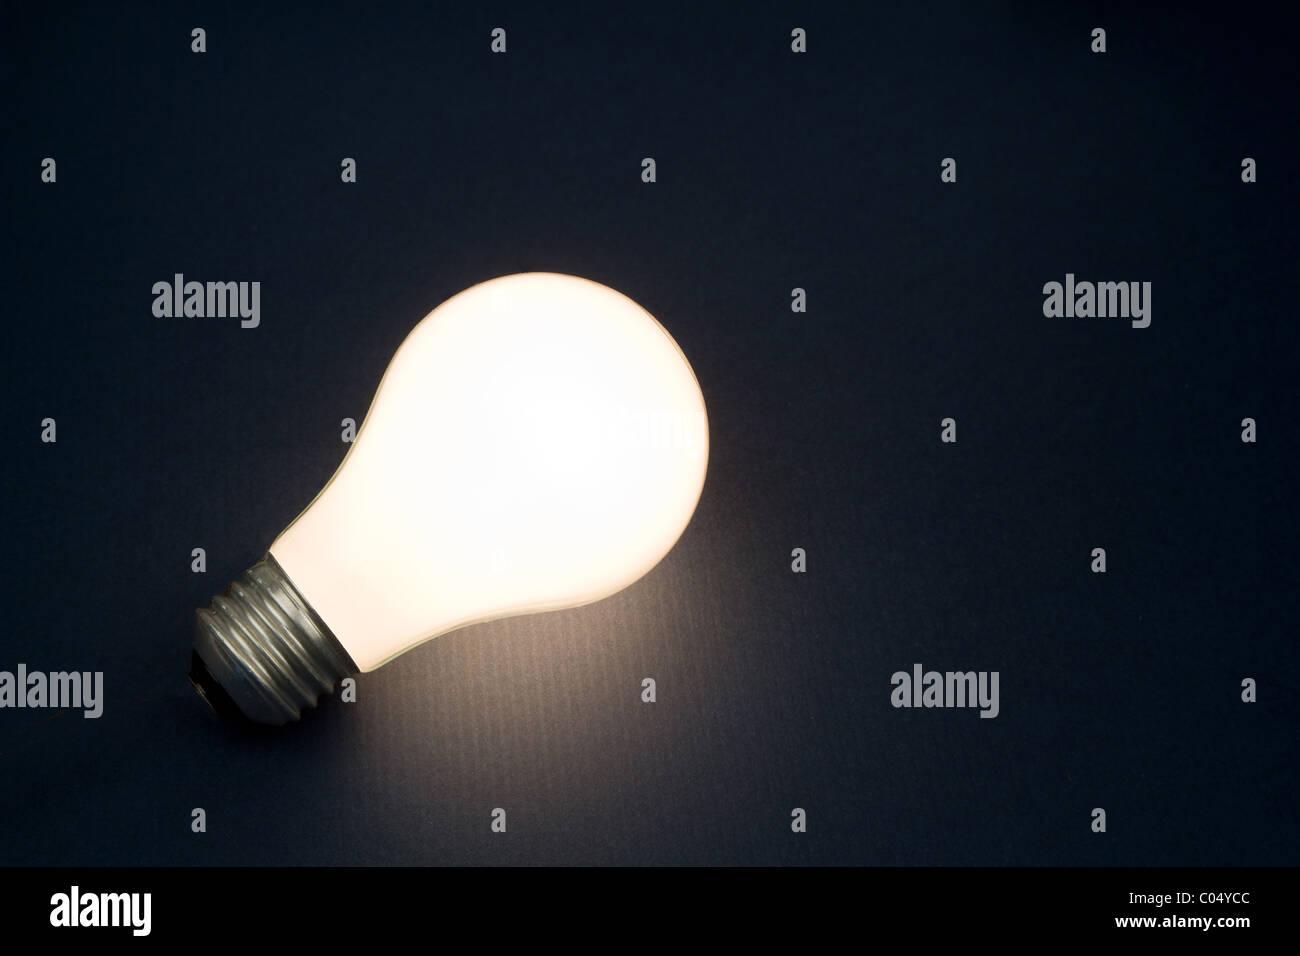 Bright Light Bulb close up shot - Stock Image